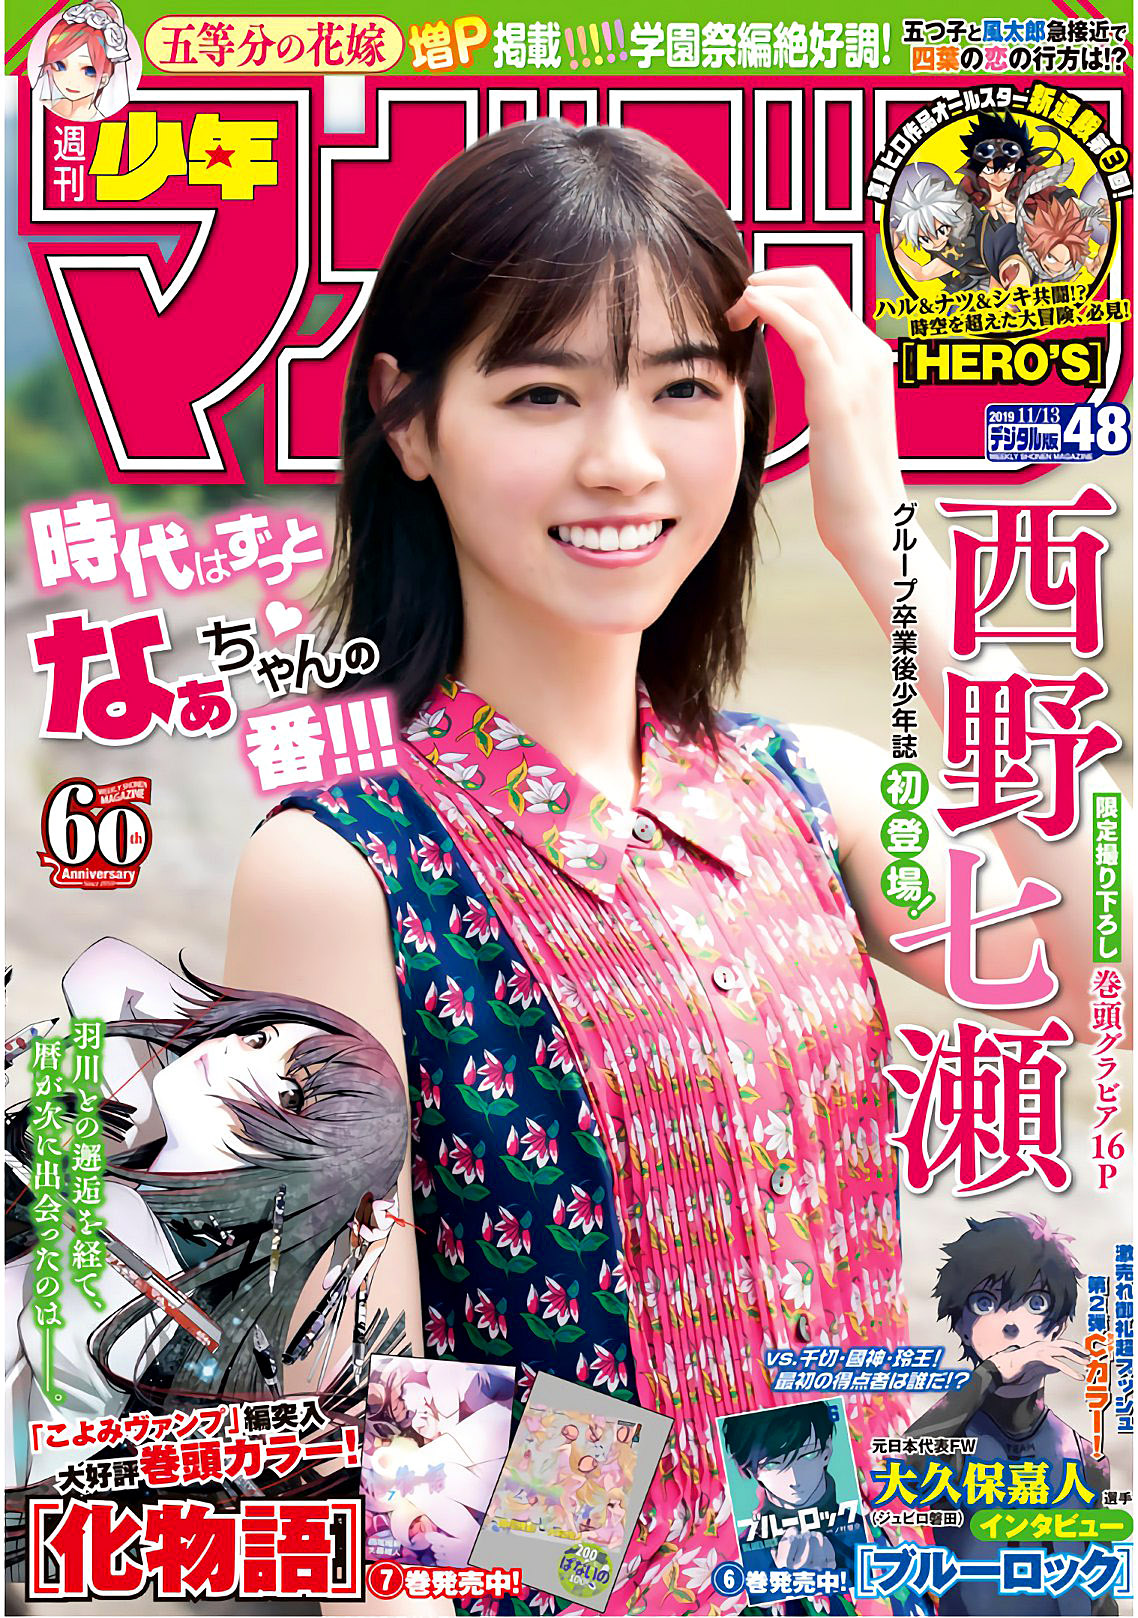 NNishino Shonen Magazine 191113 01.jpg